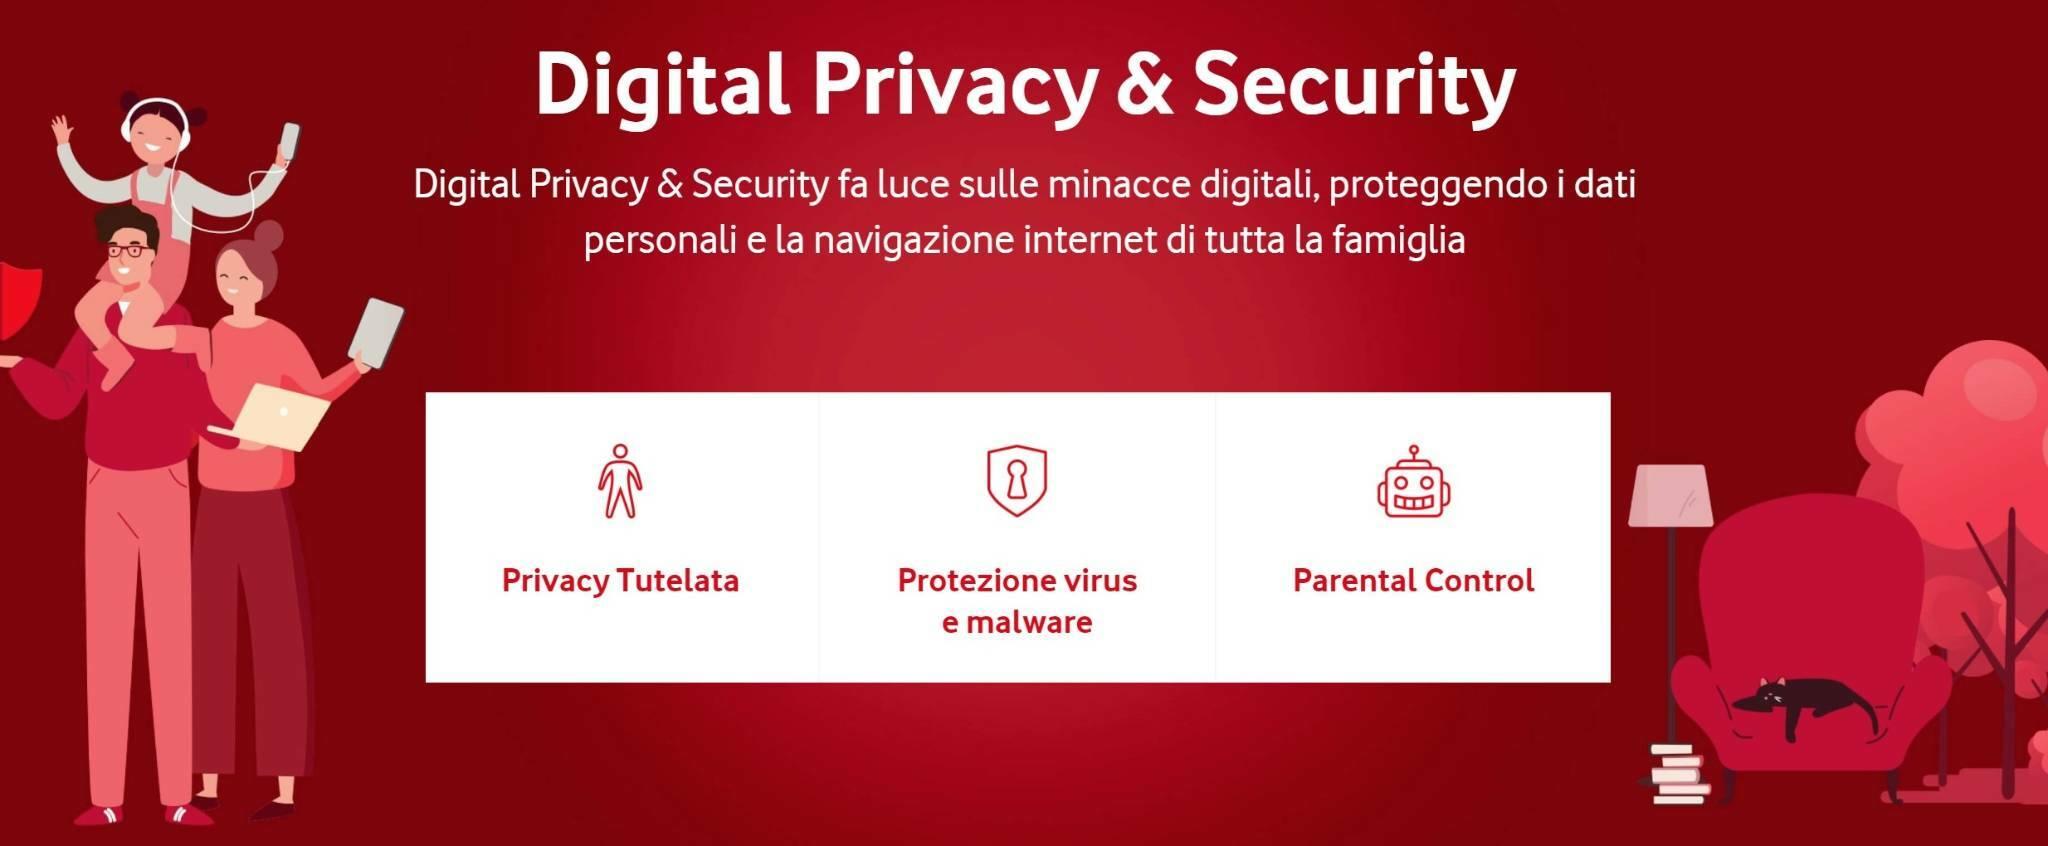 Vodafone Digital Privacy & Security